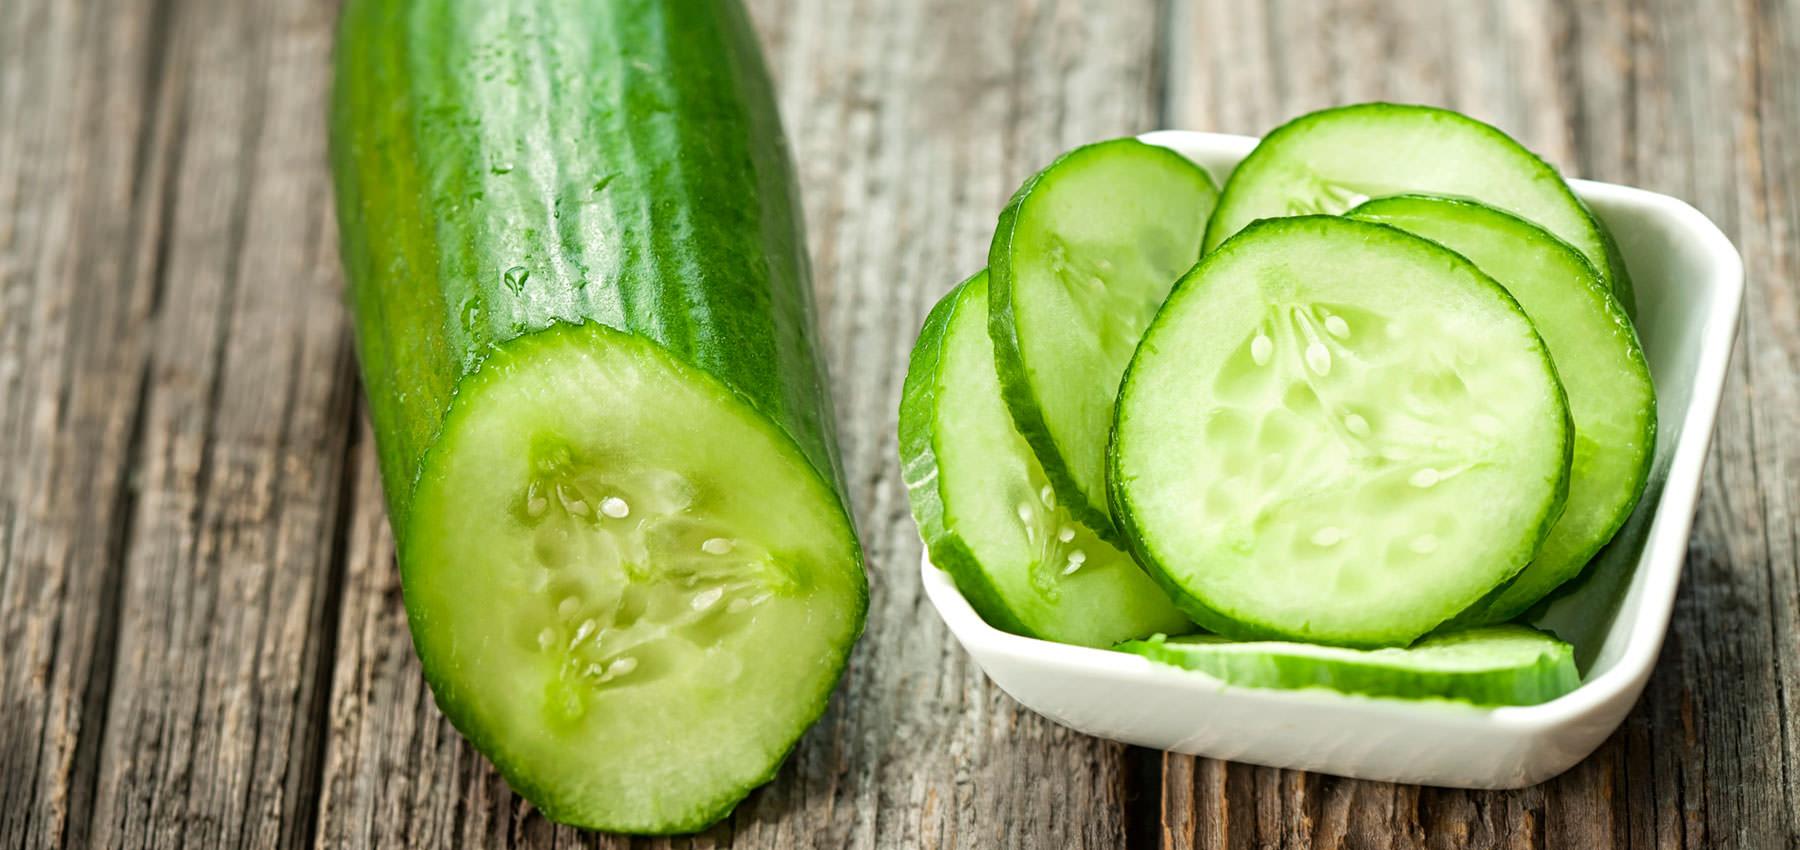 Cucumber-Apple-Rings-R1